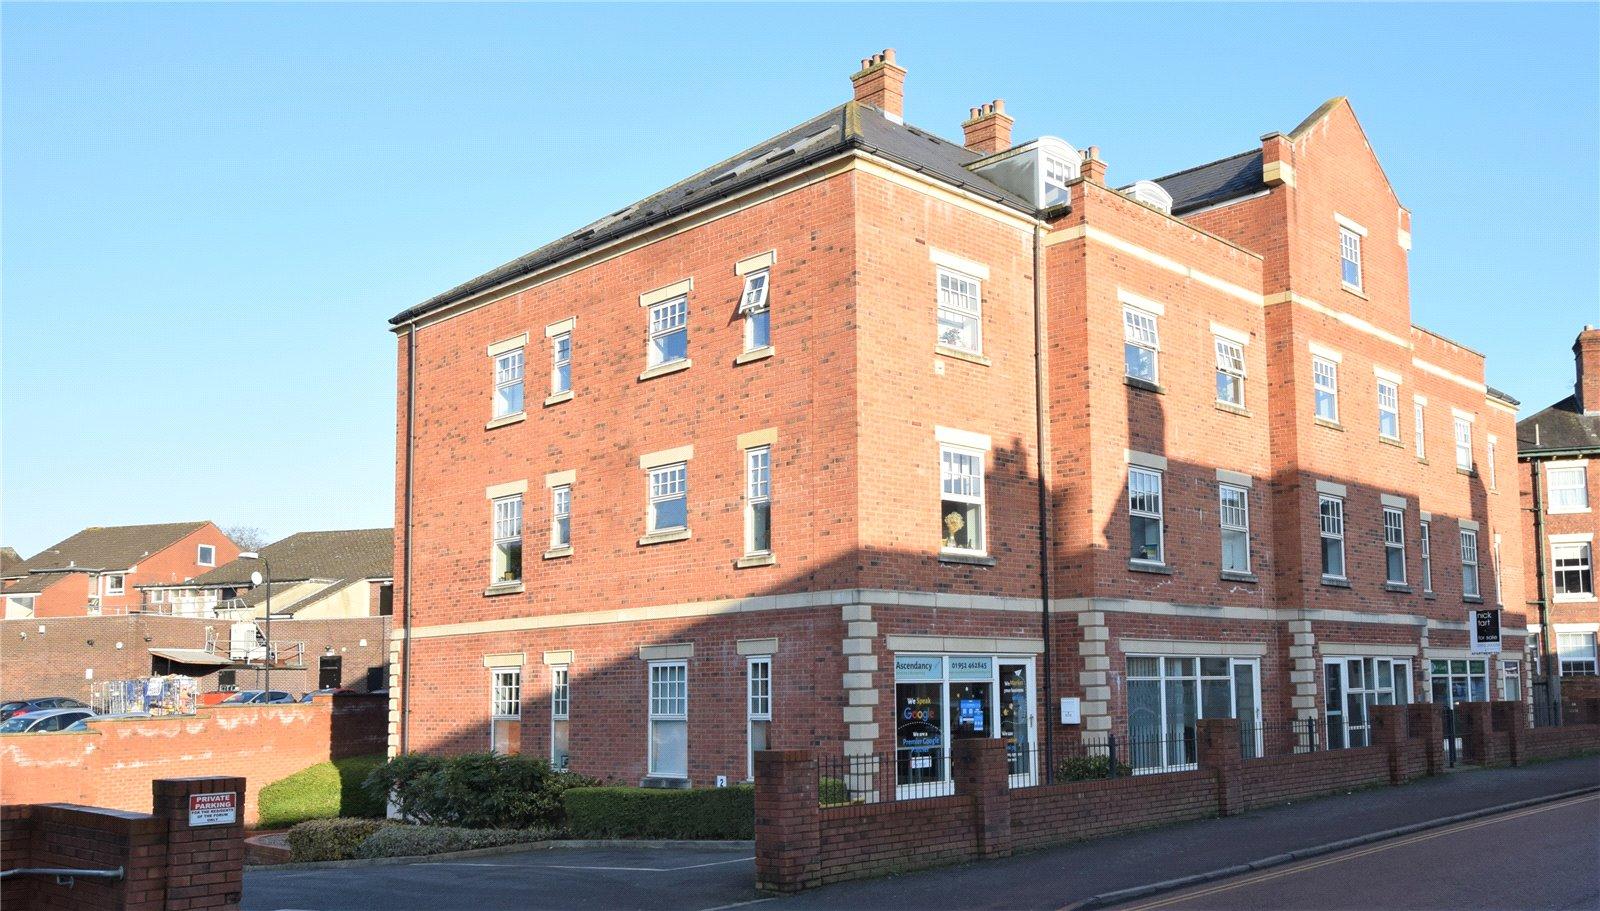 Apartment 10, The Forum, Victoria Road, Shifnal, Shropshire, TF11